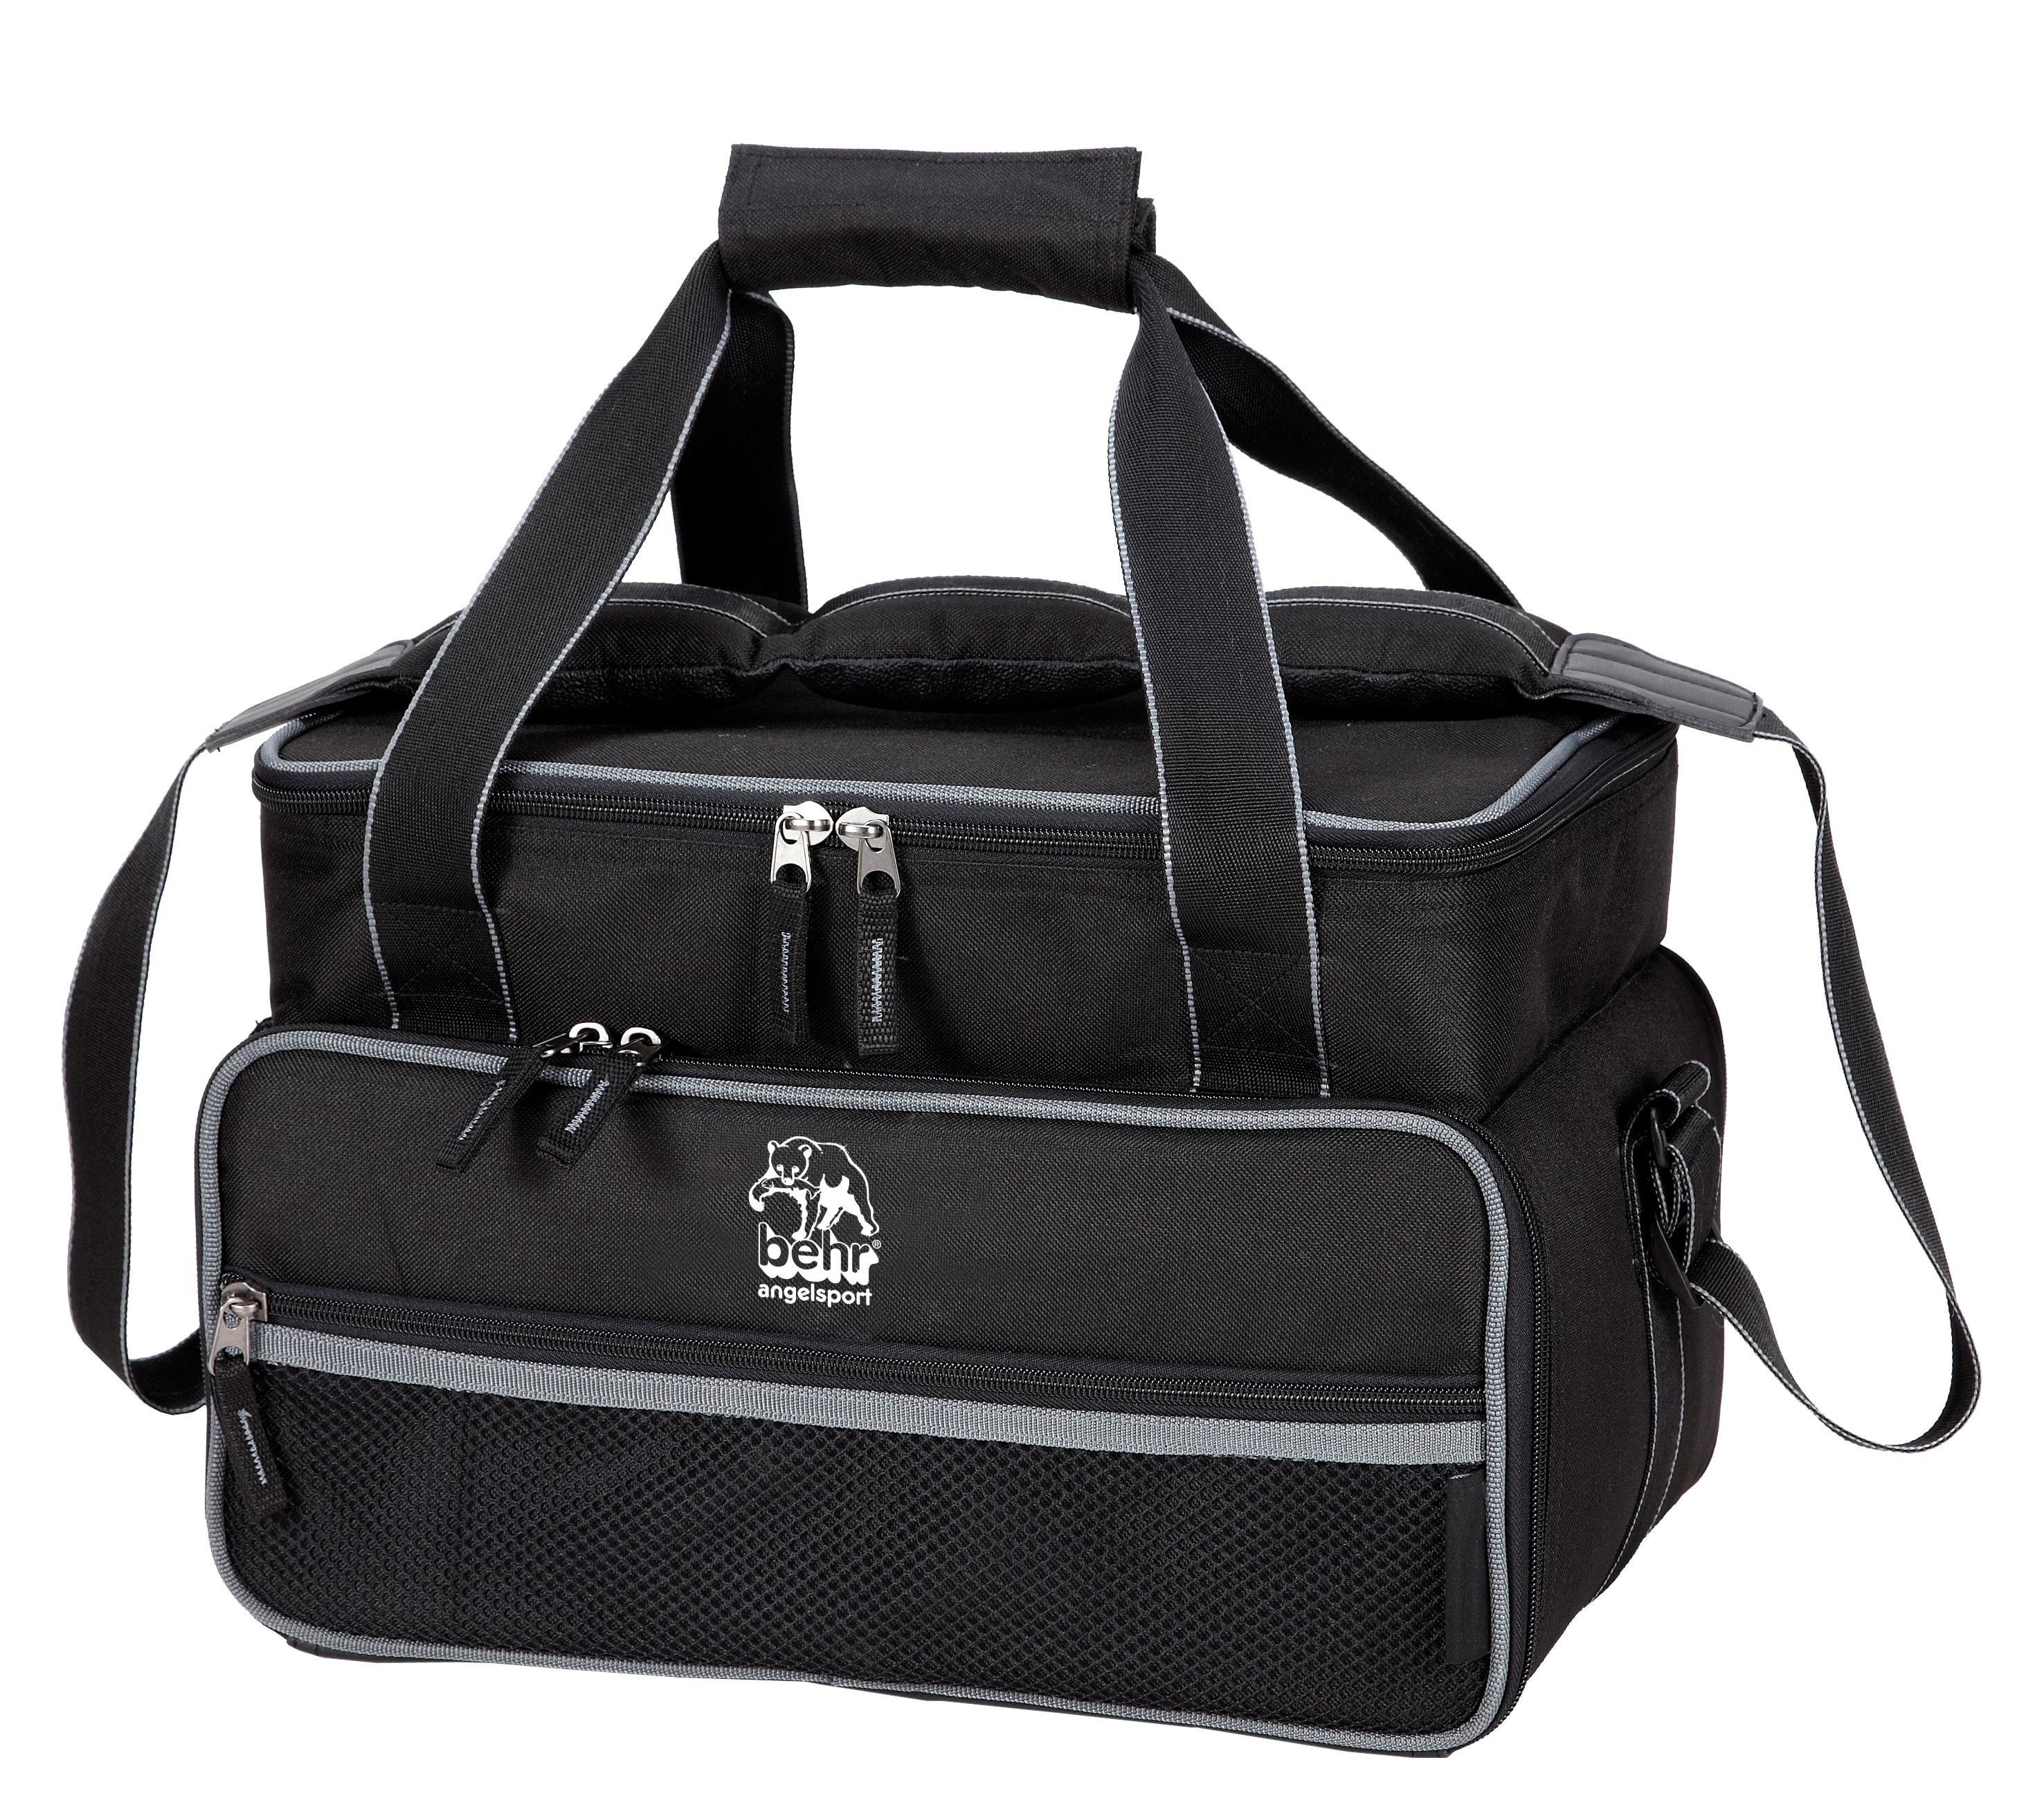 Behr taška Trendex Baggy 6